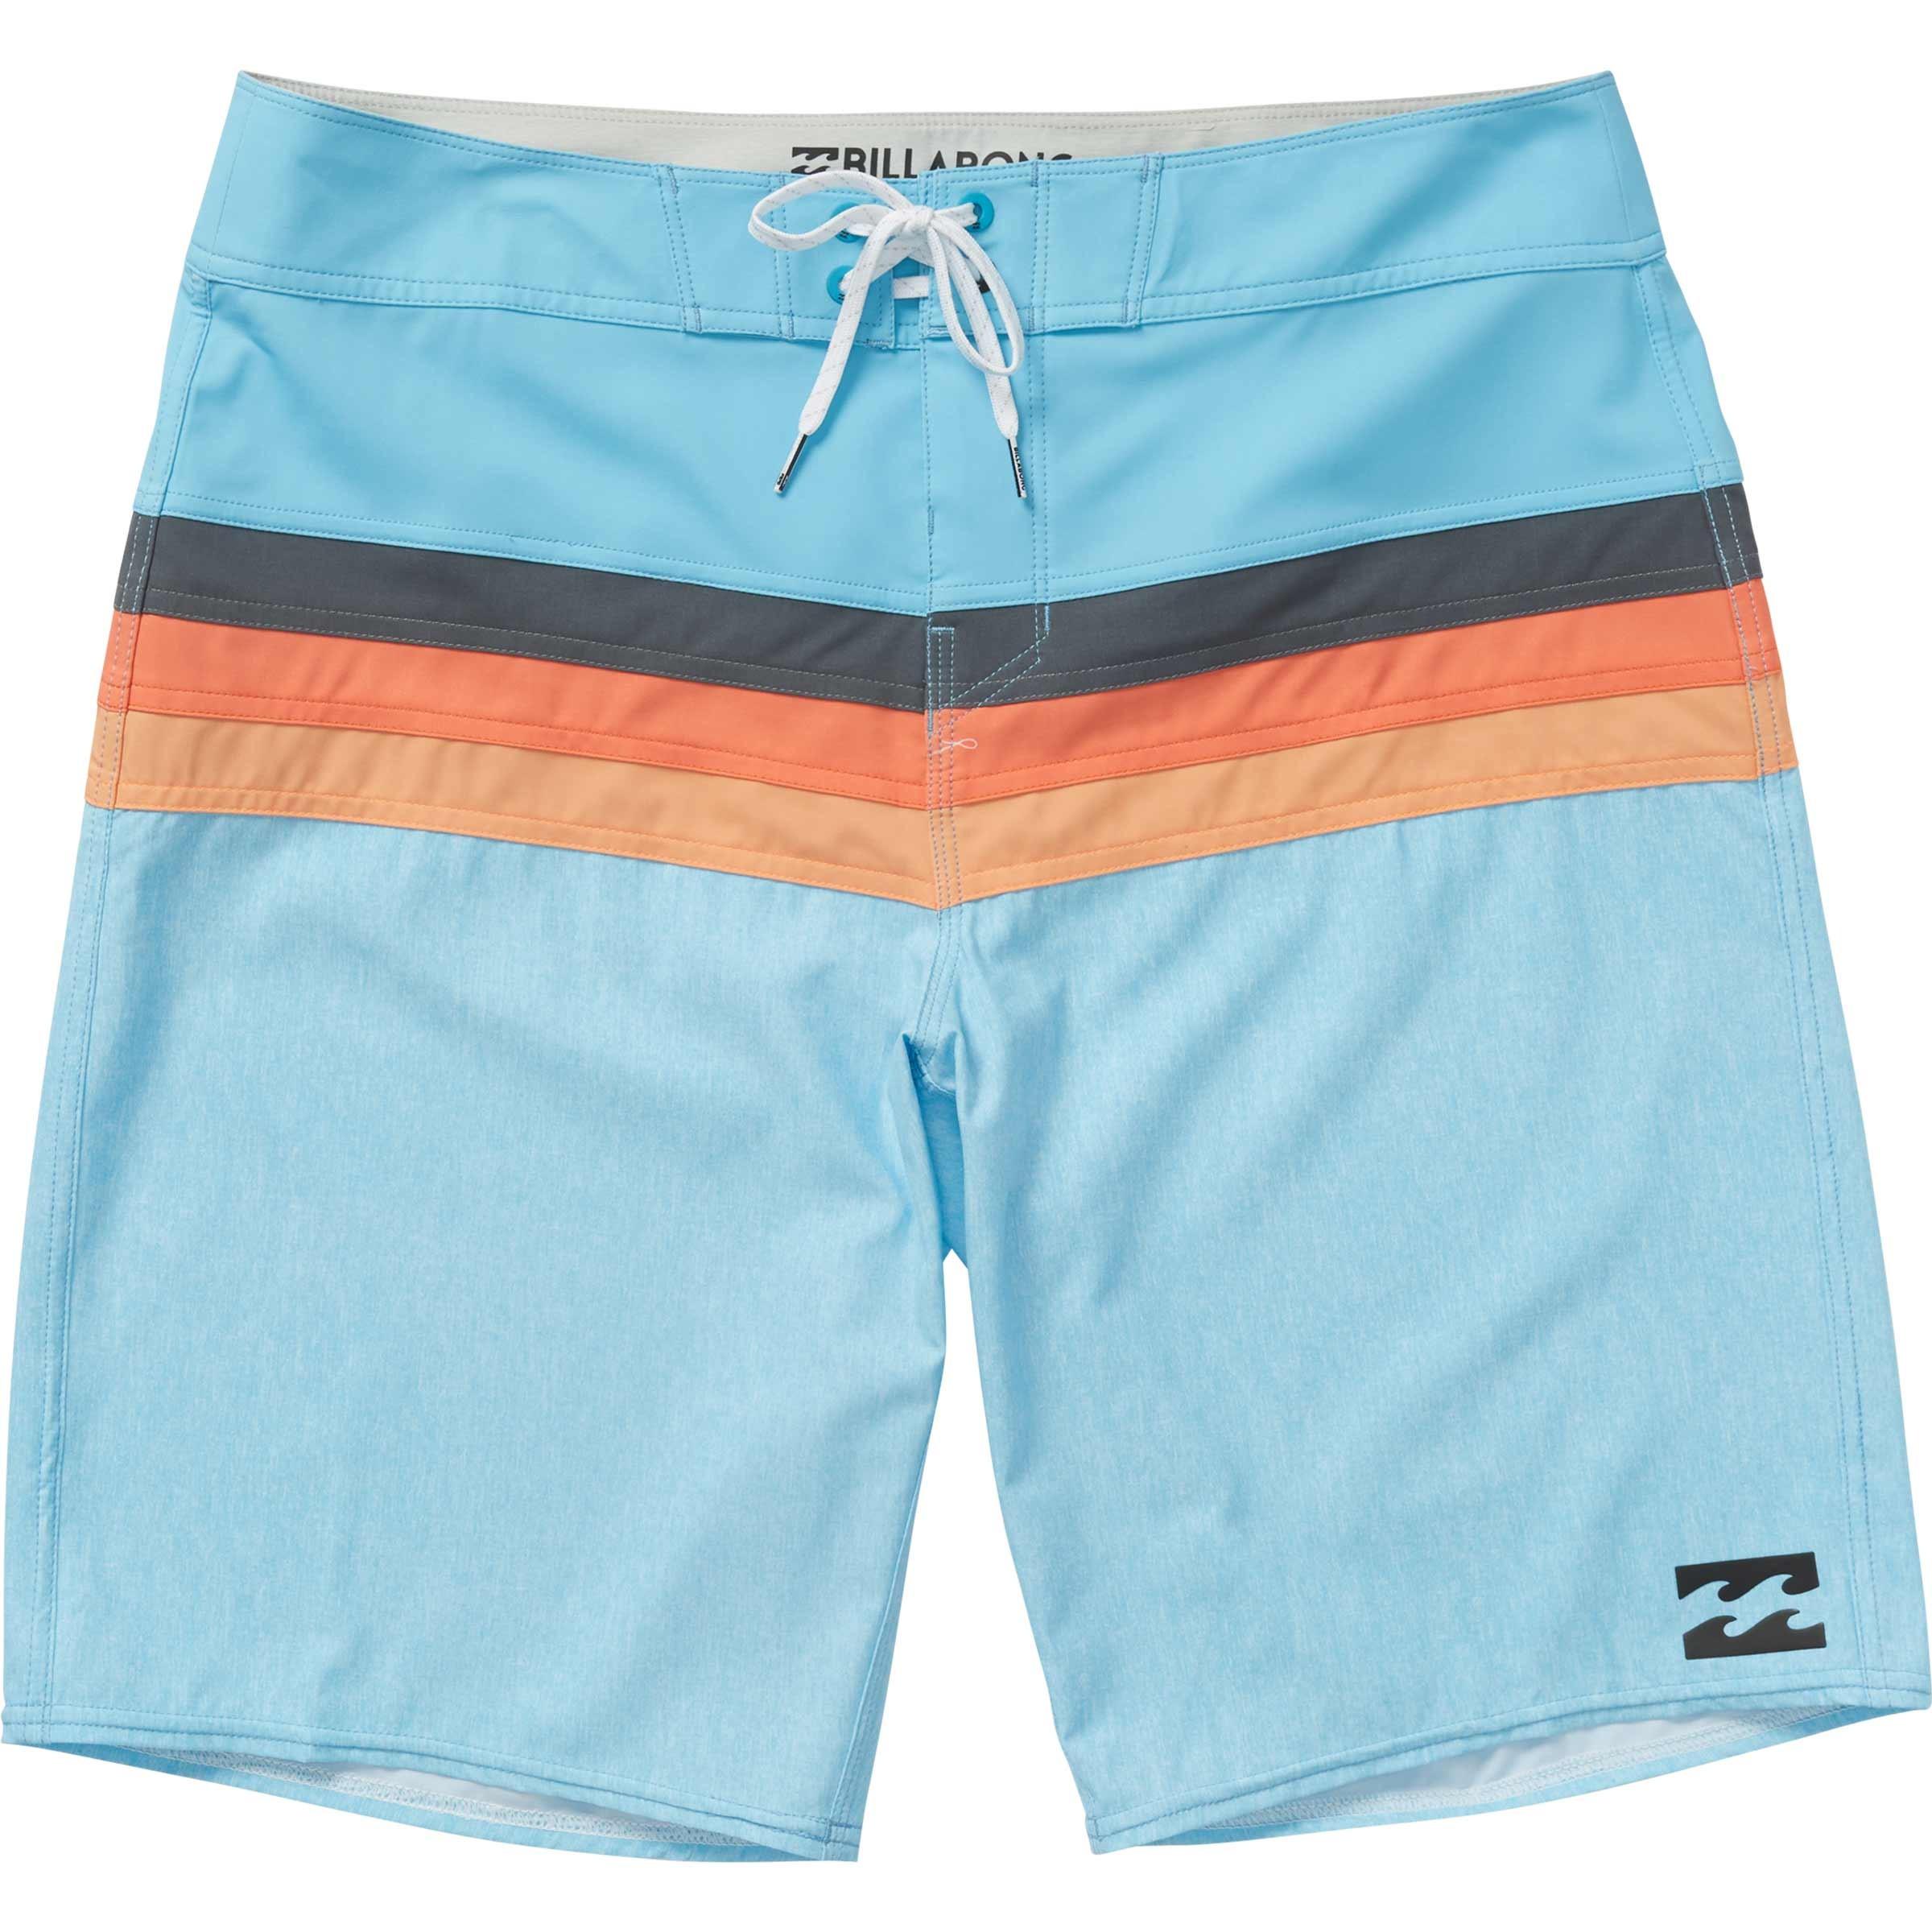 Billabong Momentum X Boardshorts (Men's)